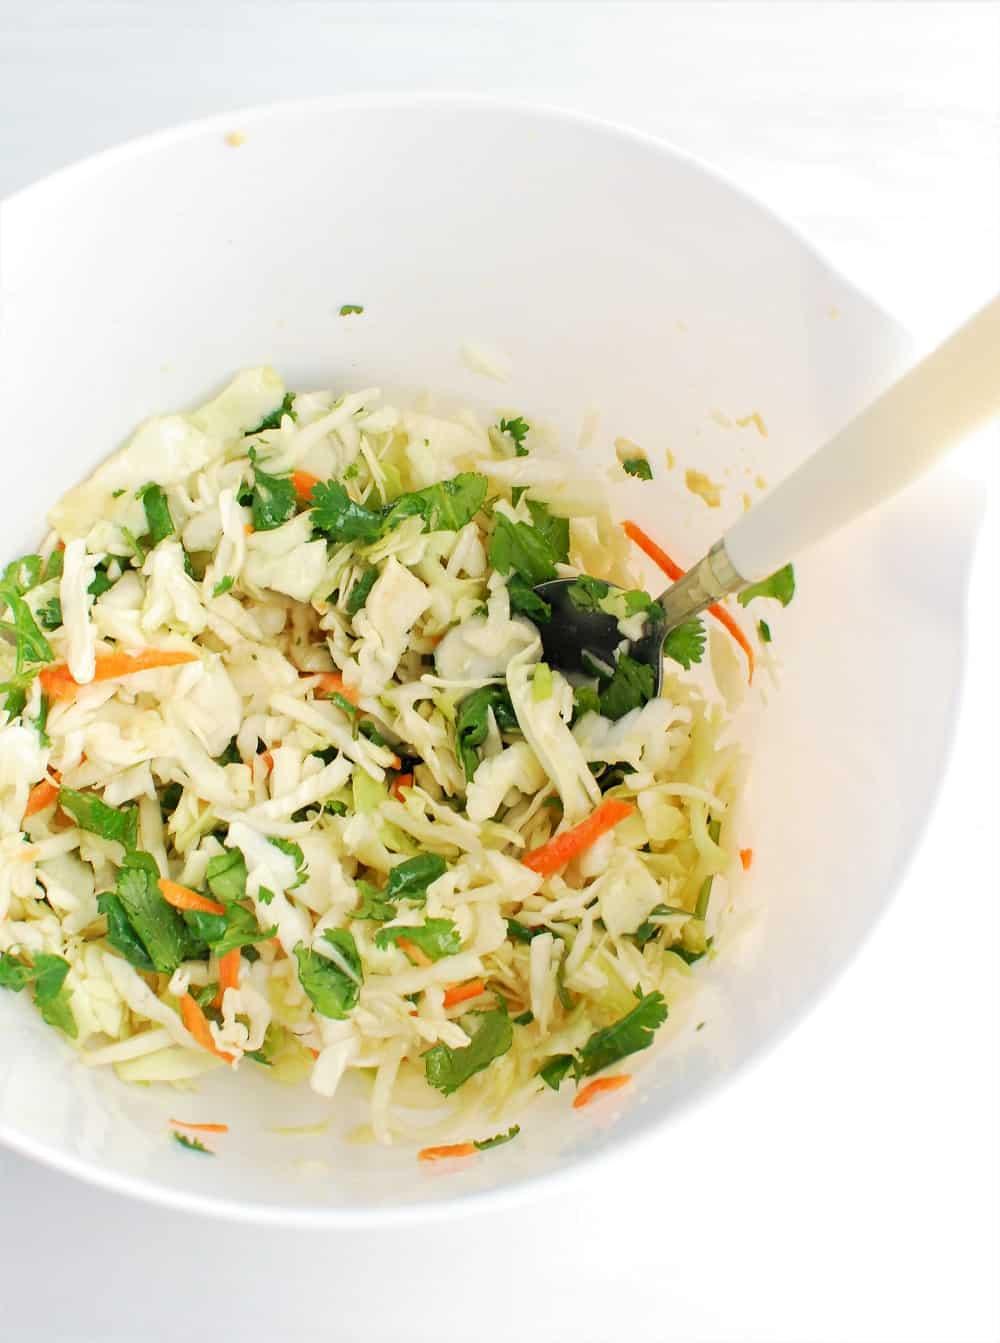 a white bowl full of cabbage slaw